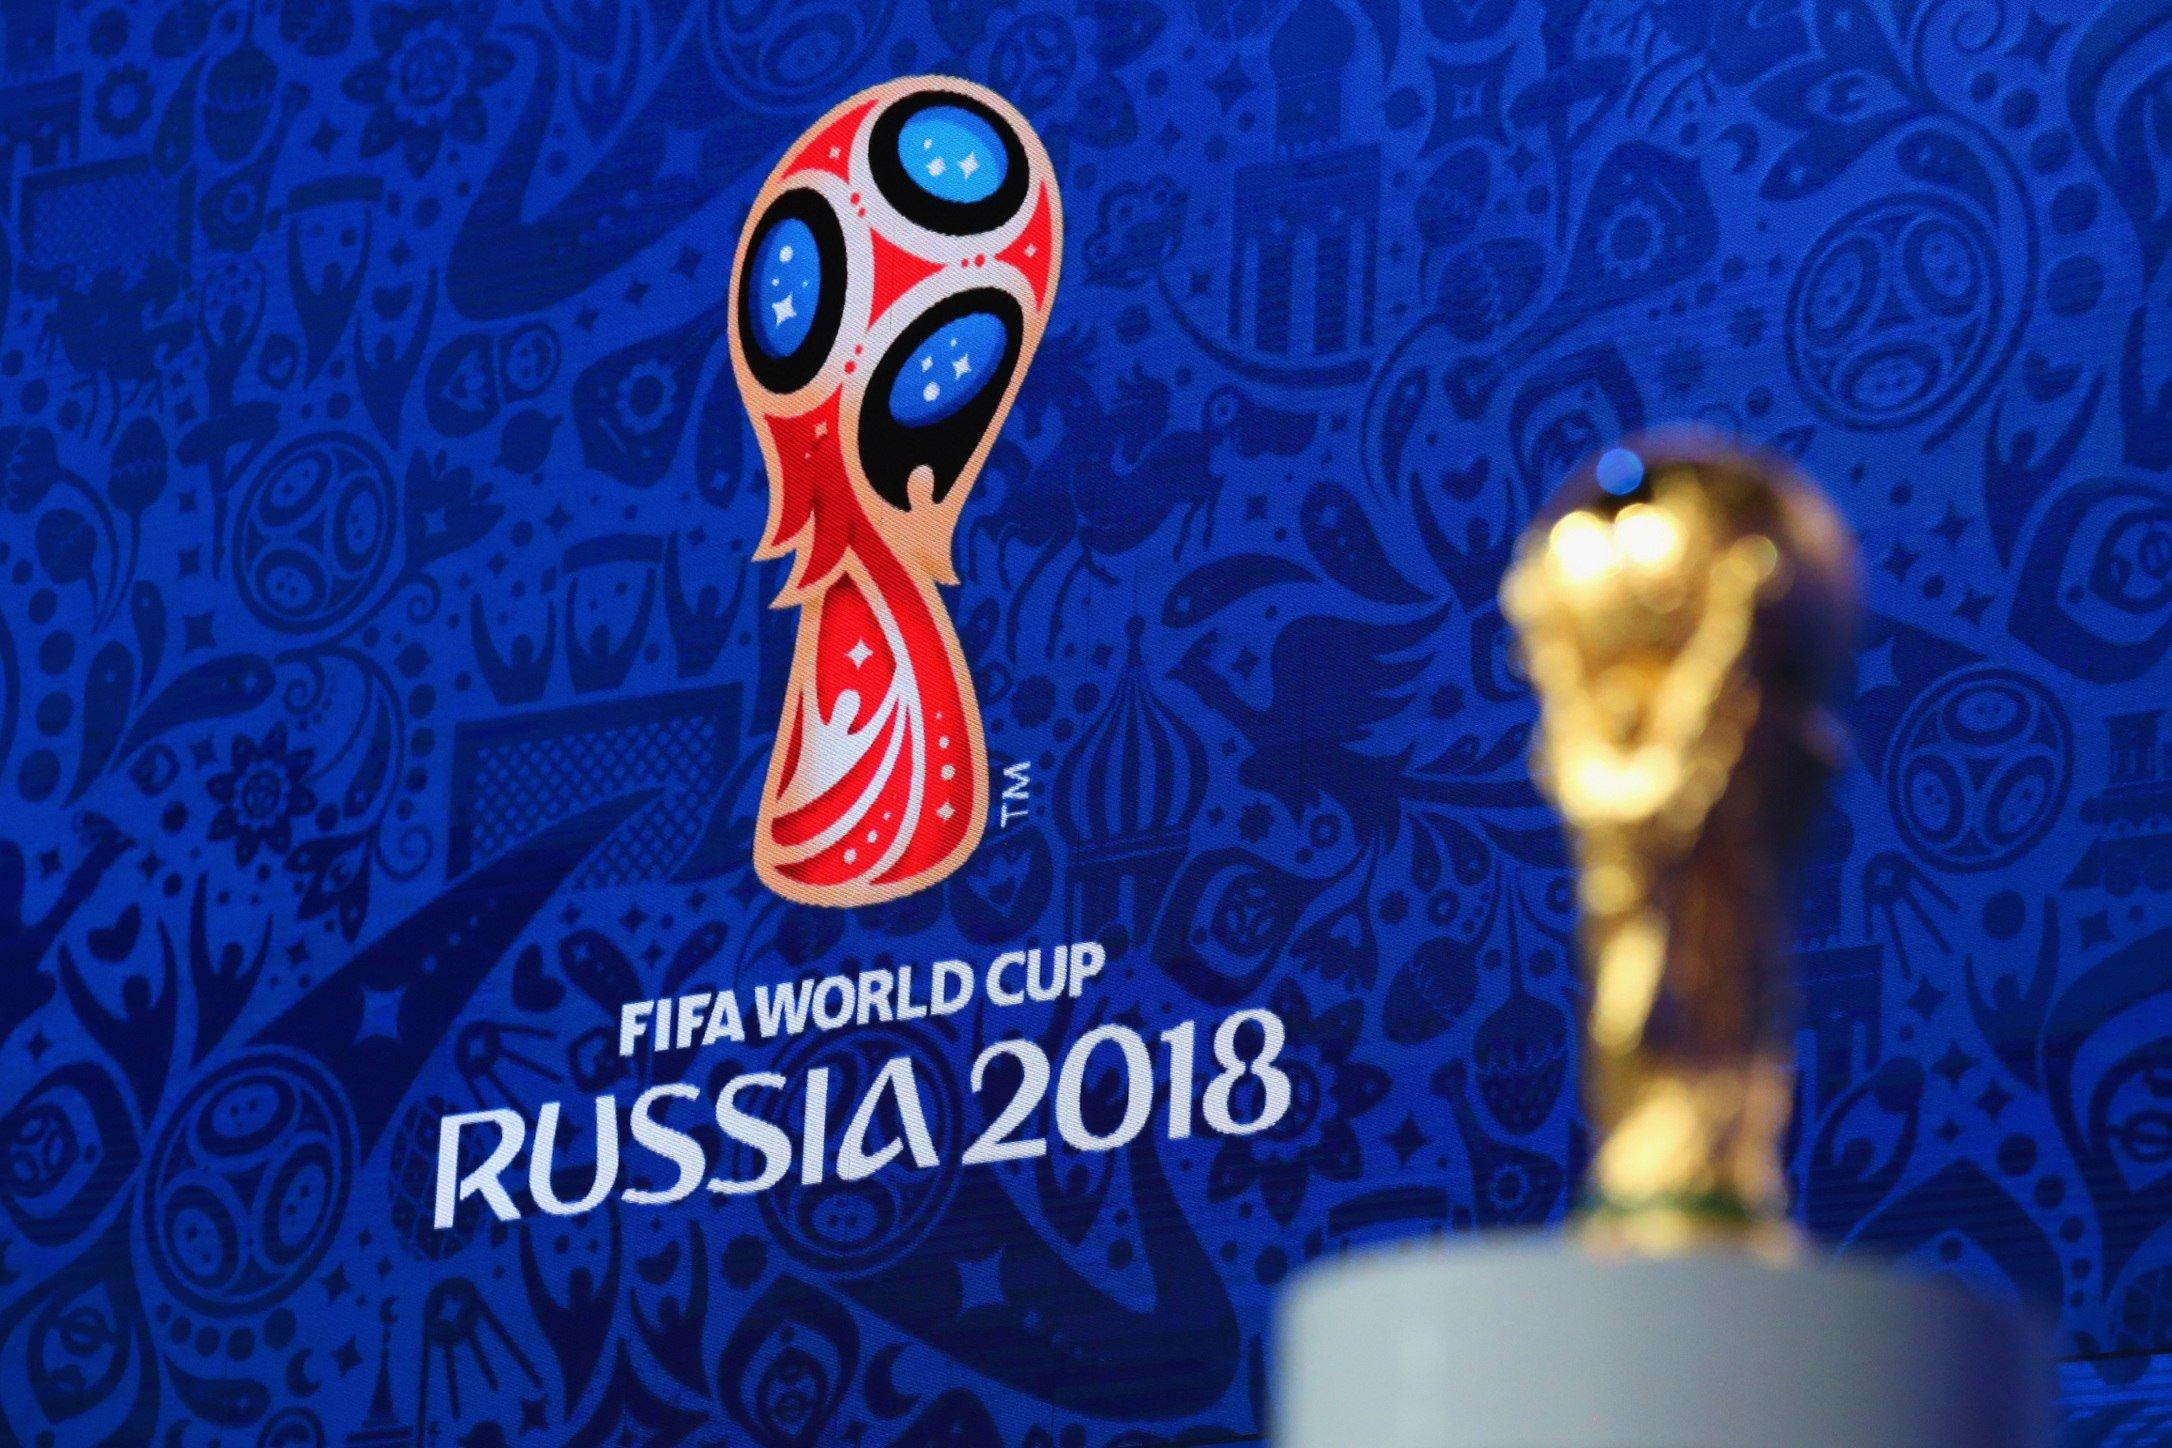 объекты чемпионата мира по футболу 2018